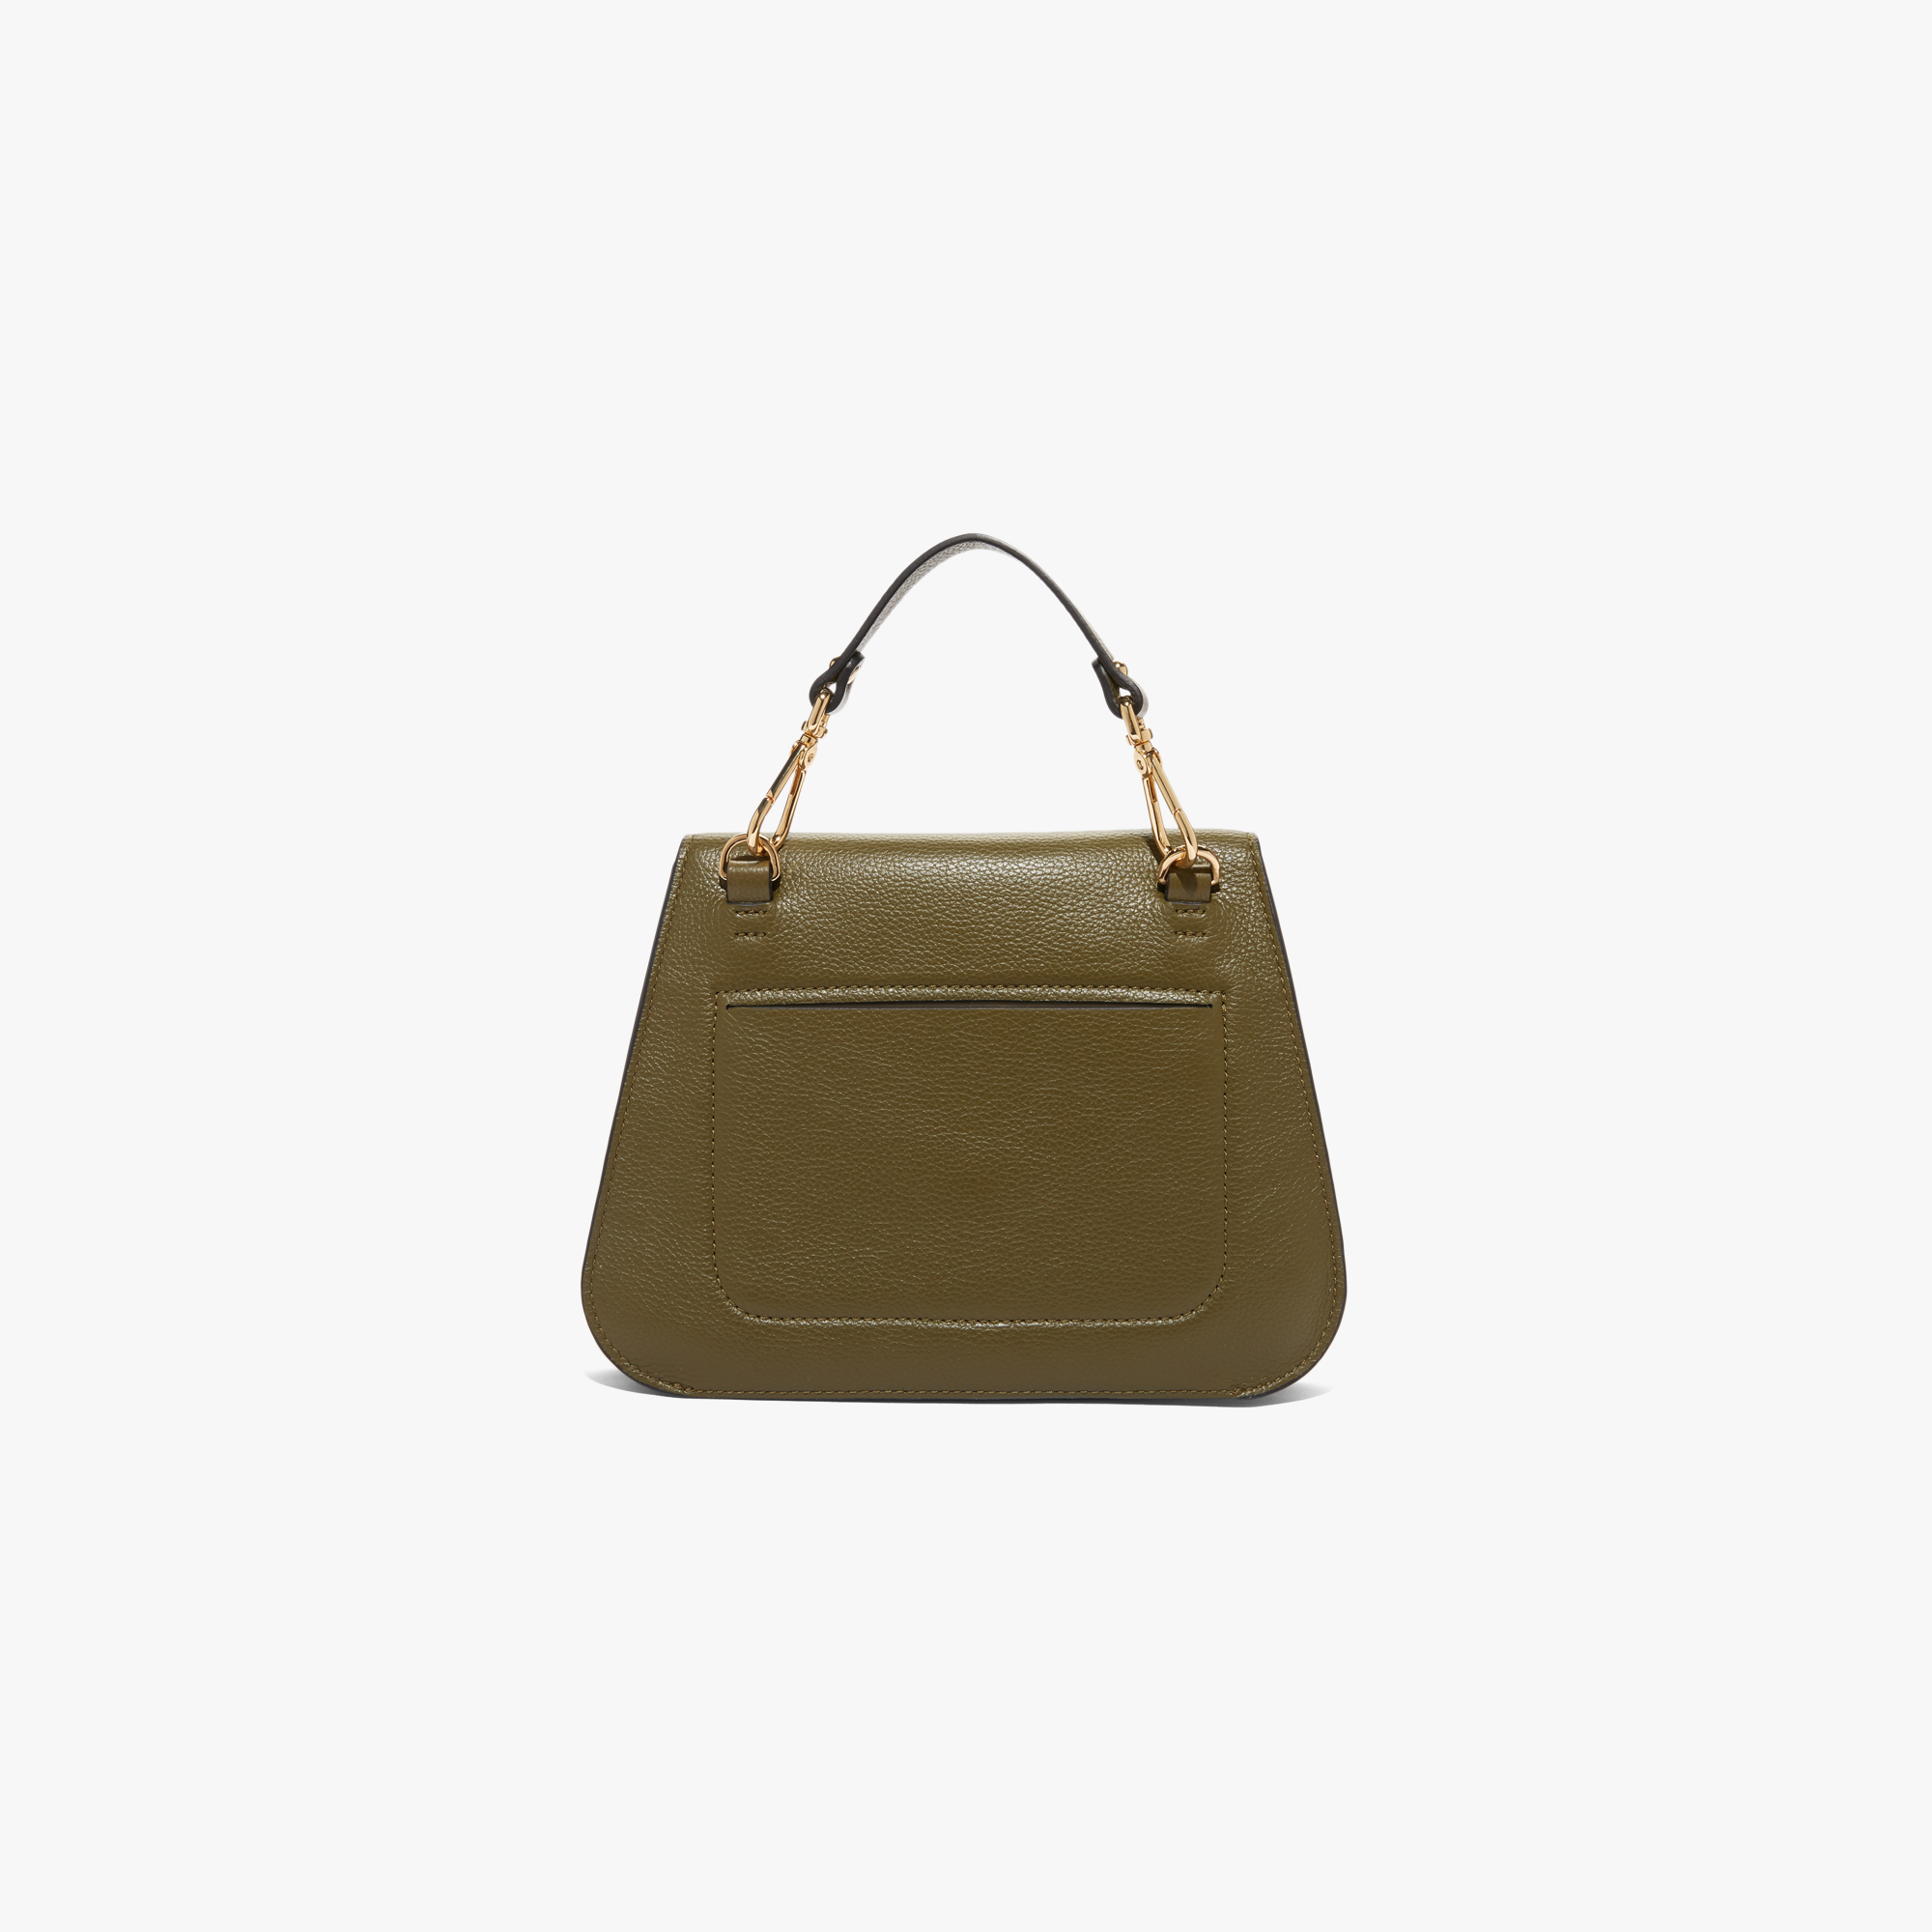 100% Zufriedenheitsgarantie Super Rabatt viele Stile Women's Mini Bags | Coccinelle - Jalouse Mini